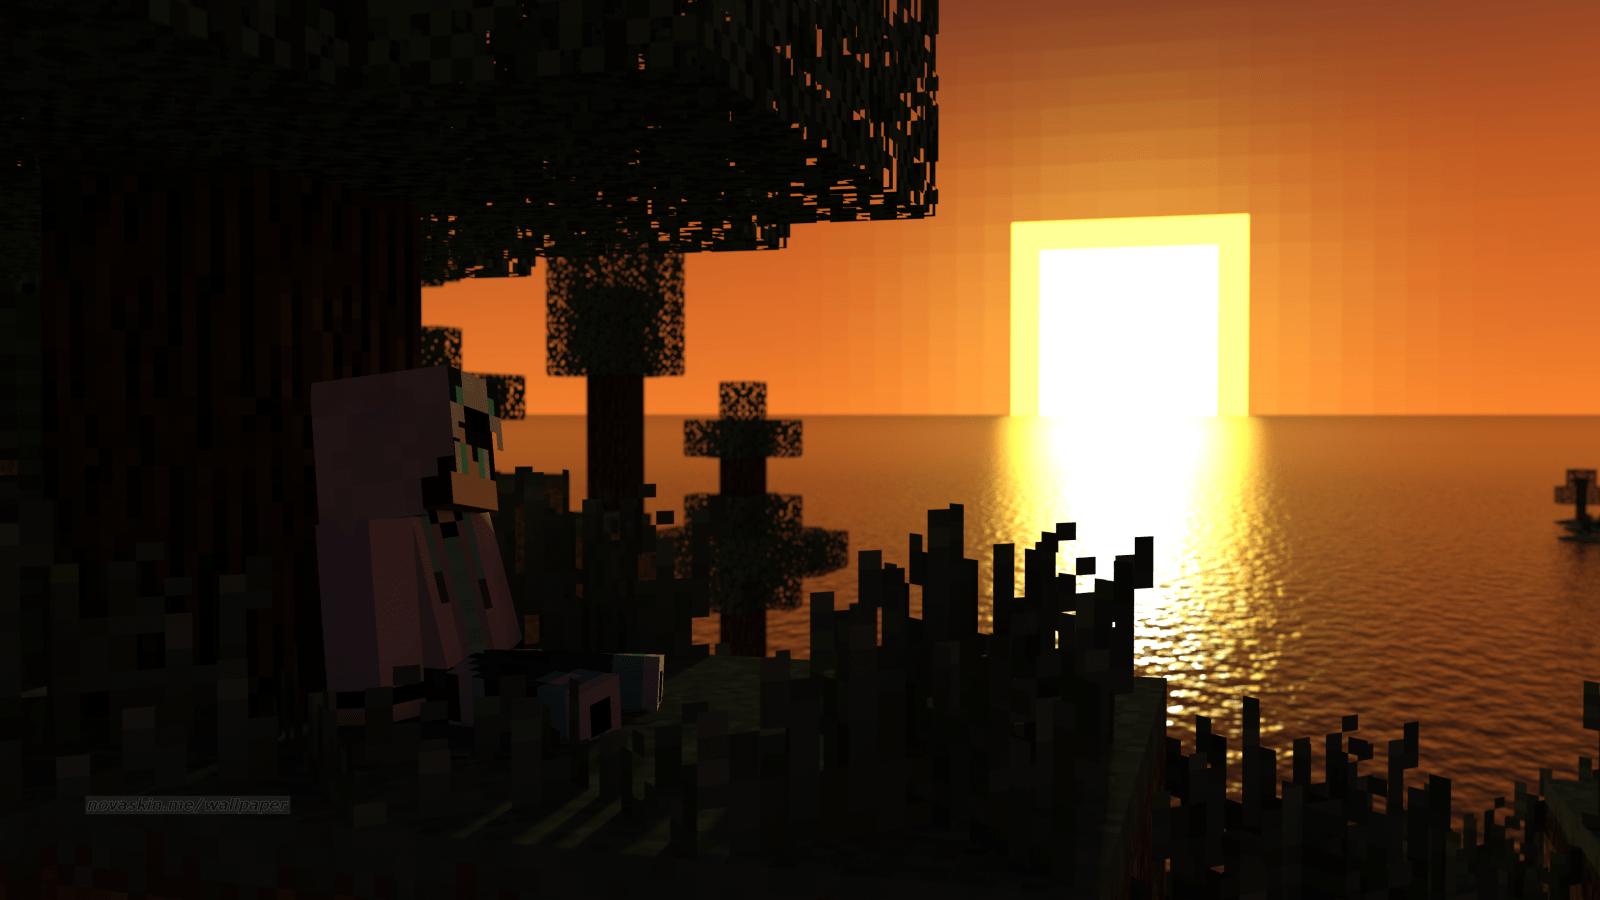 Minecraft Sunset Wallpapers Top Free Minecraft Sunset Backgrounds Wallpaperaccess